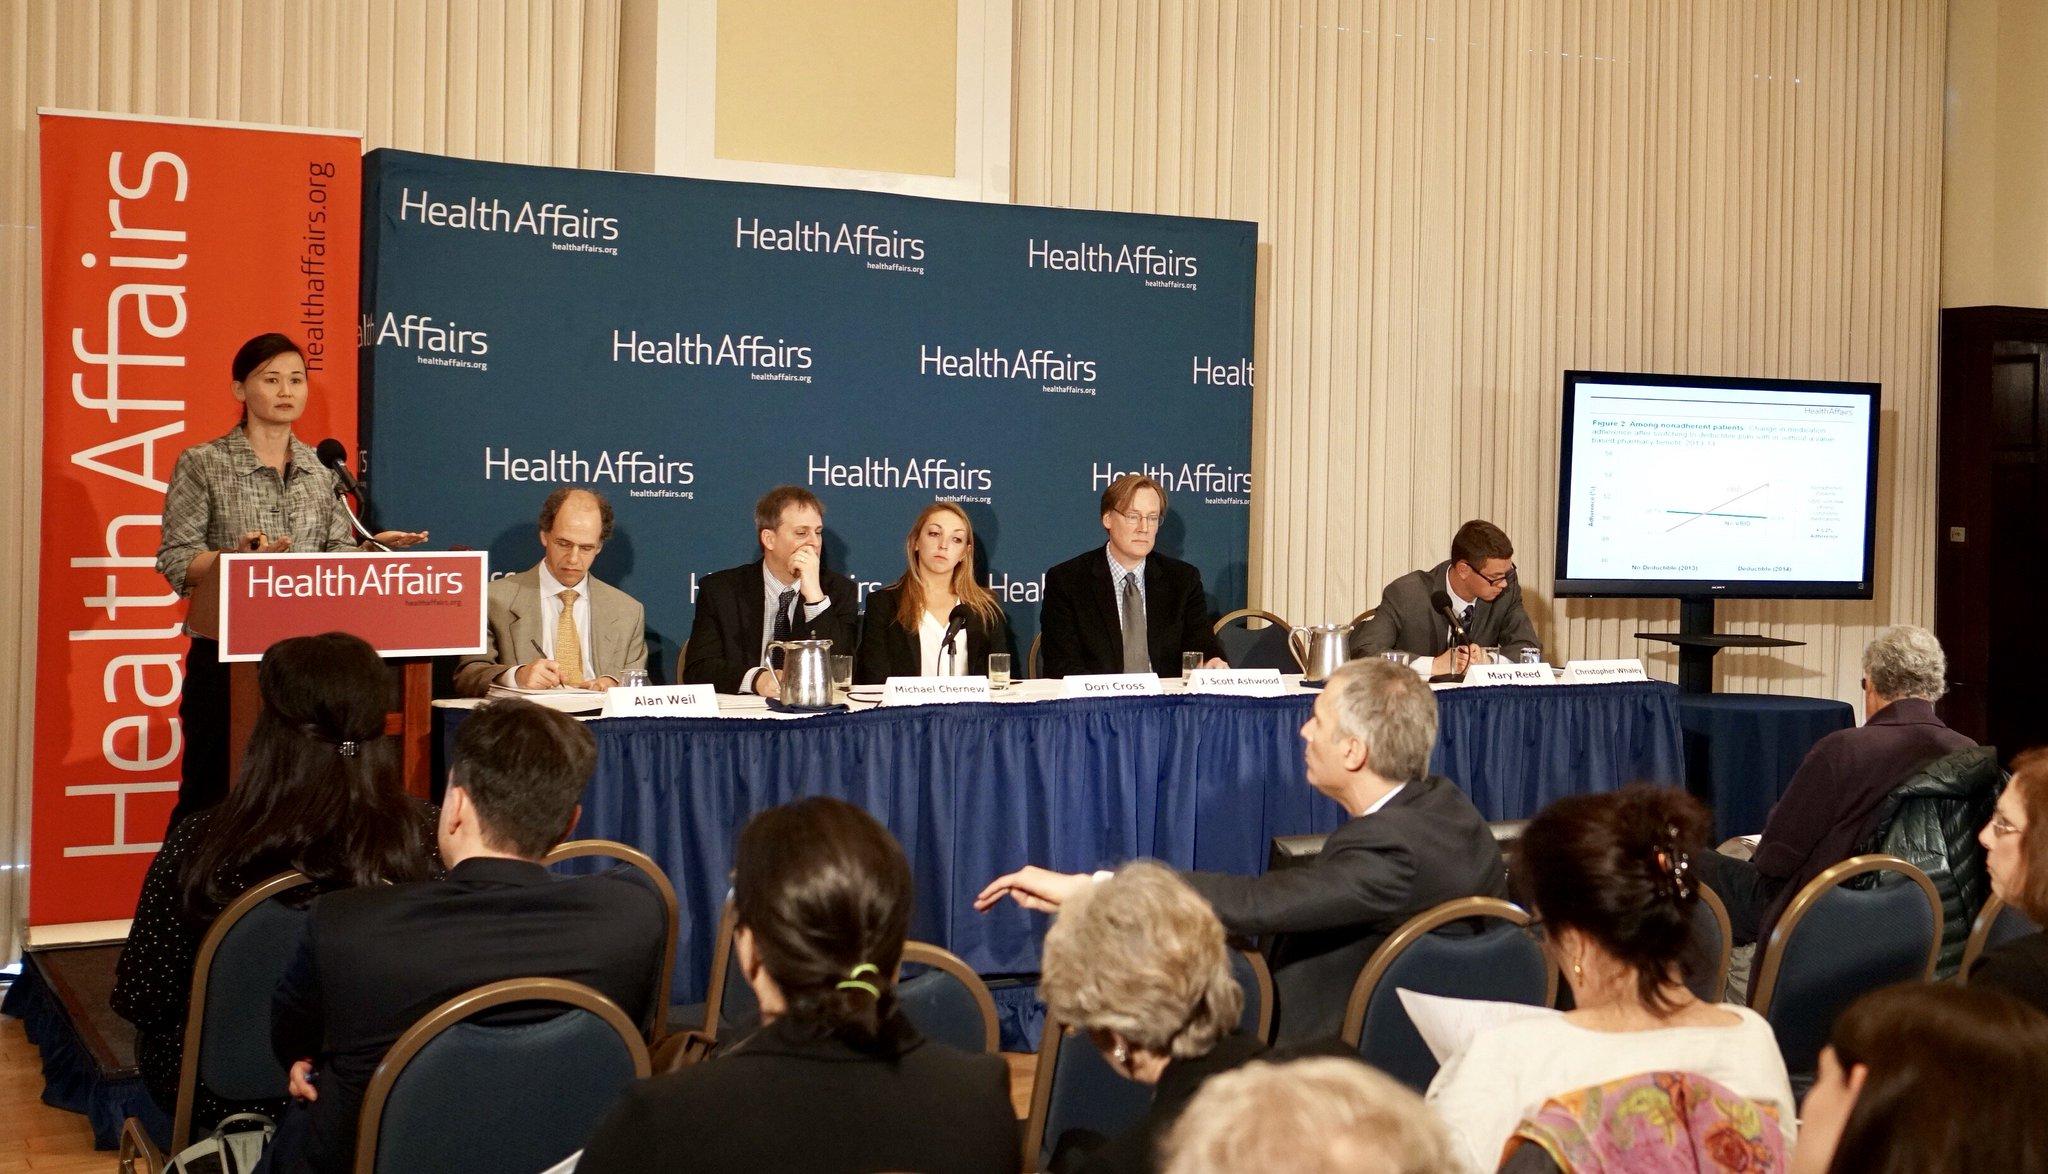 It's @KPDOR in Washington DC 👍 #deliveryreform @Health_Affairs   https://t.co/q2QaHivEiR https://t.co/rmoqWBAA3W